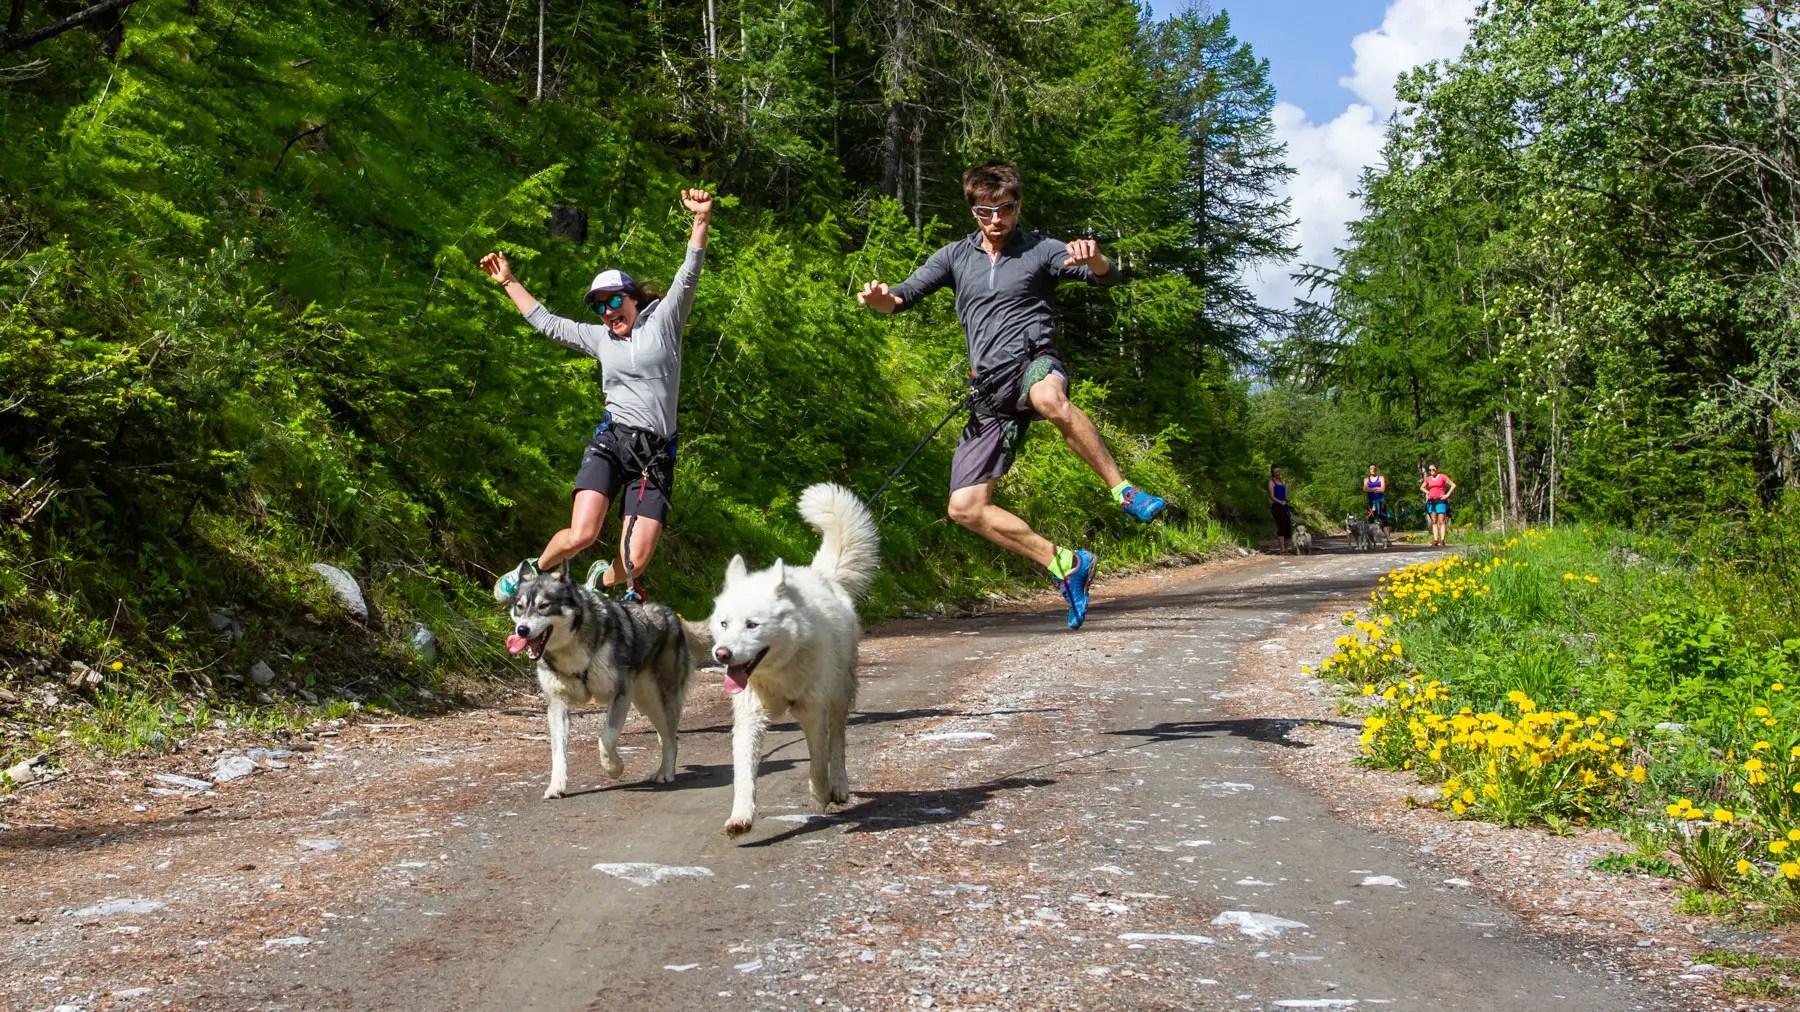 Cani-randonnée - Cani cross